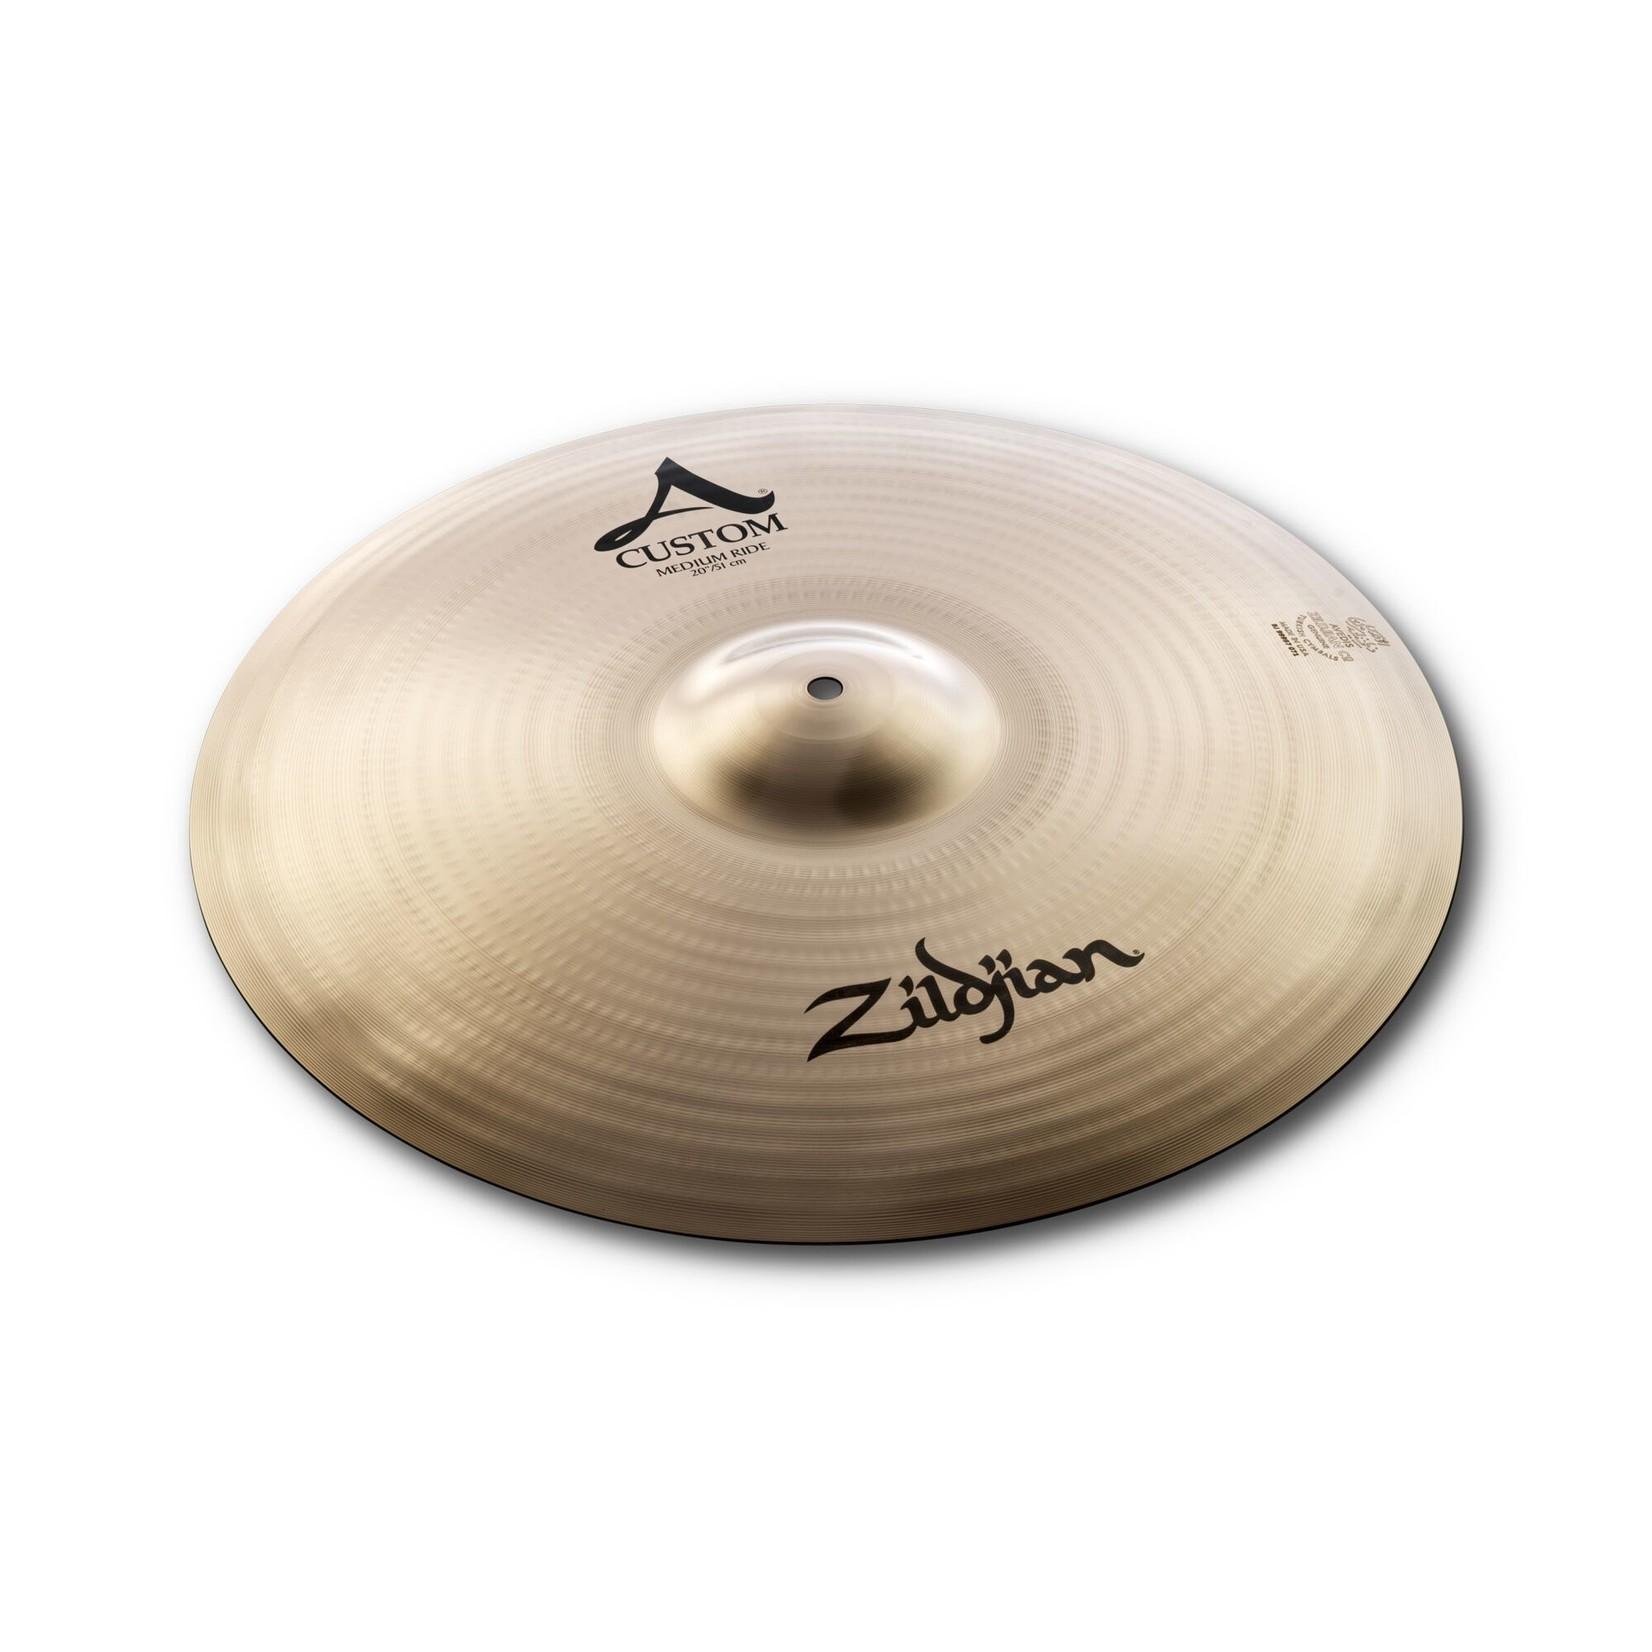 Zildjian Zildjian 20'' A Custom Medium Ride